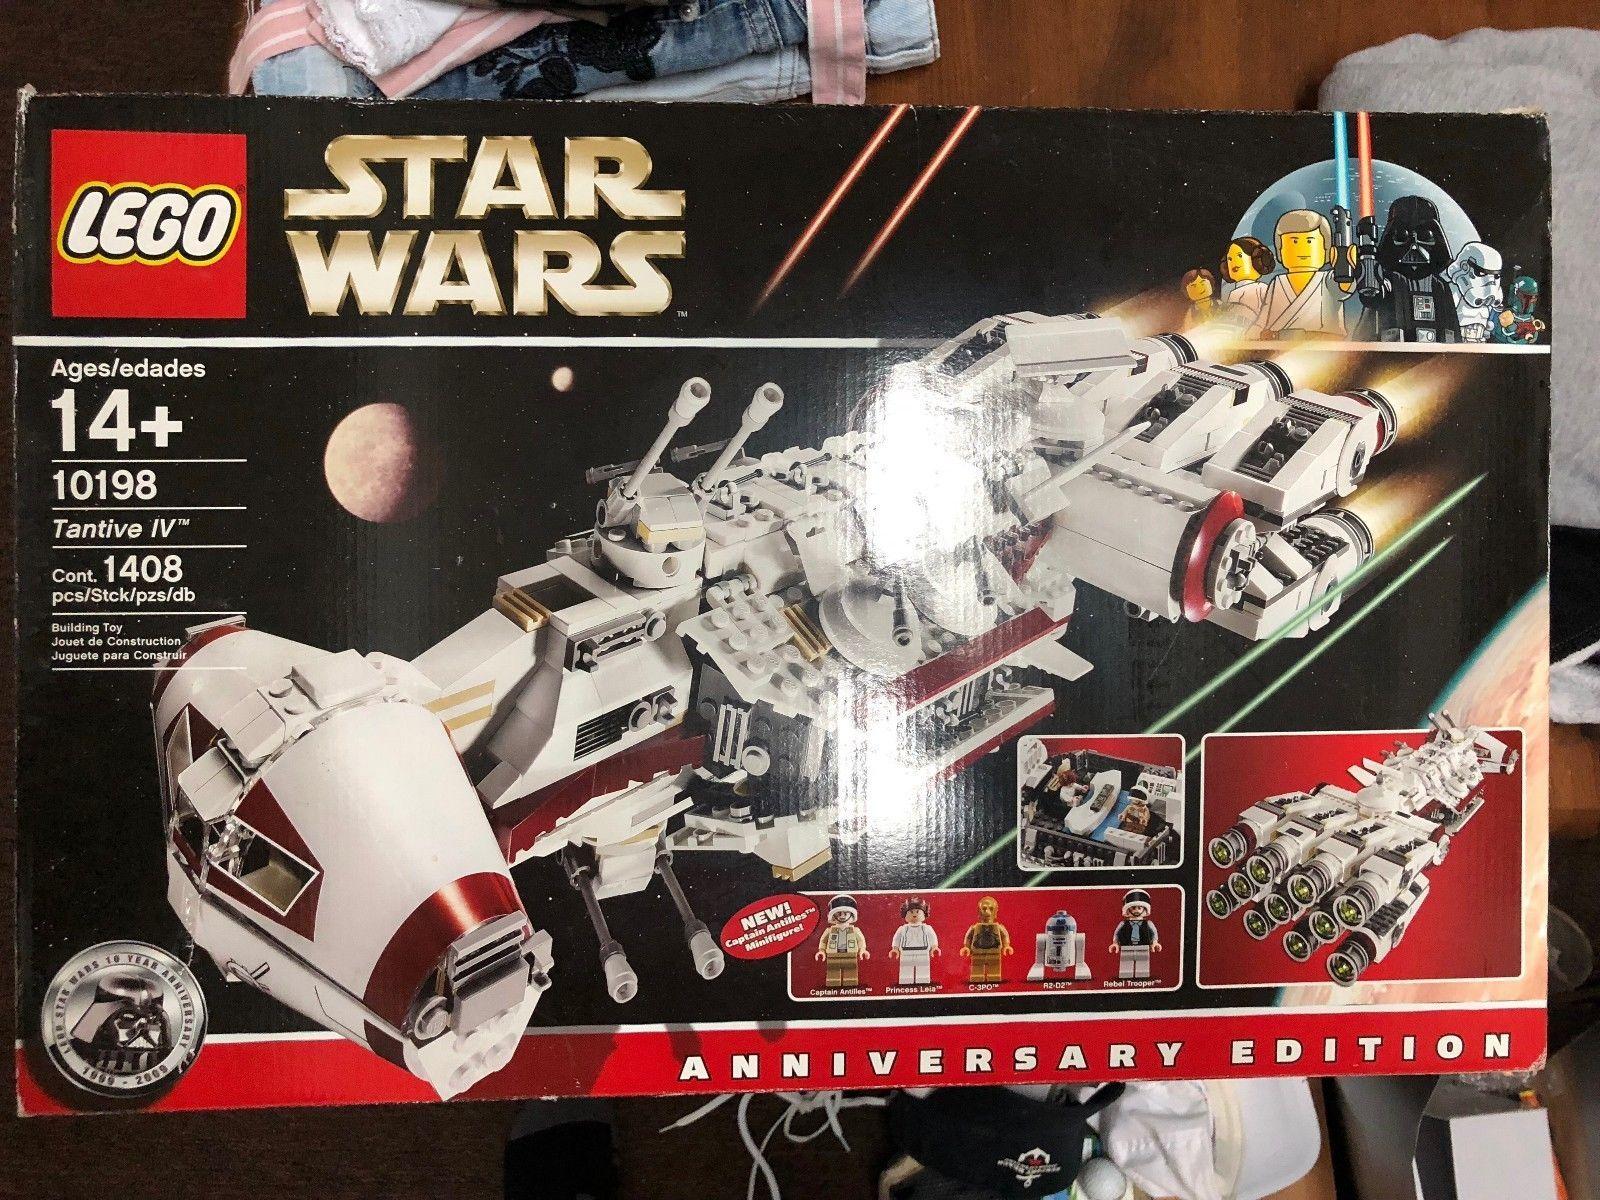 10198 Lego Star Wars New Factory Sealed Tantive Iv 1408 Pcs Retired Rare Lego Star Wars Lego Star Wars Sets Lego War